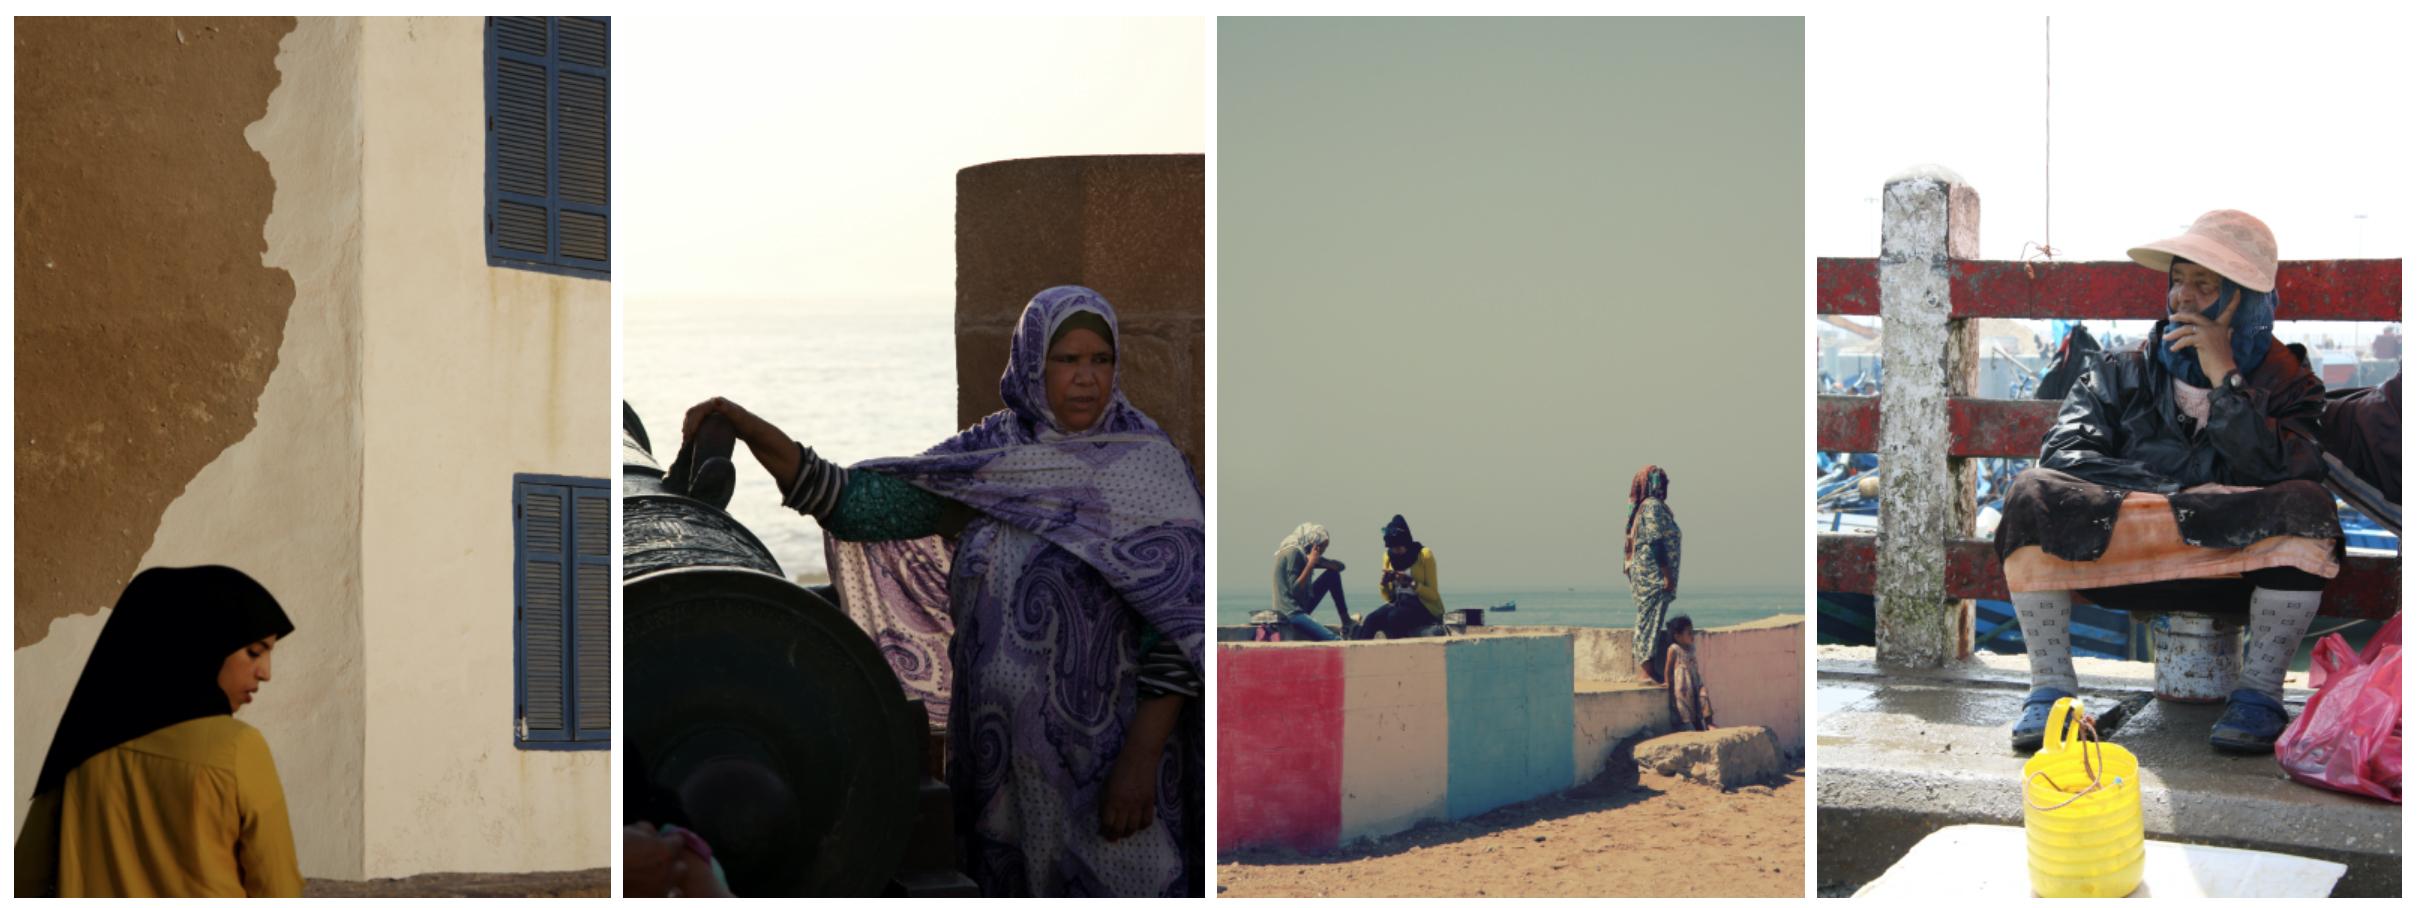 mariaferresamat_photography_morocco_women_portrait_1